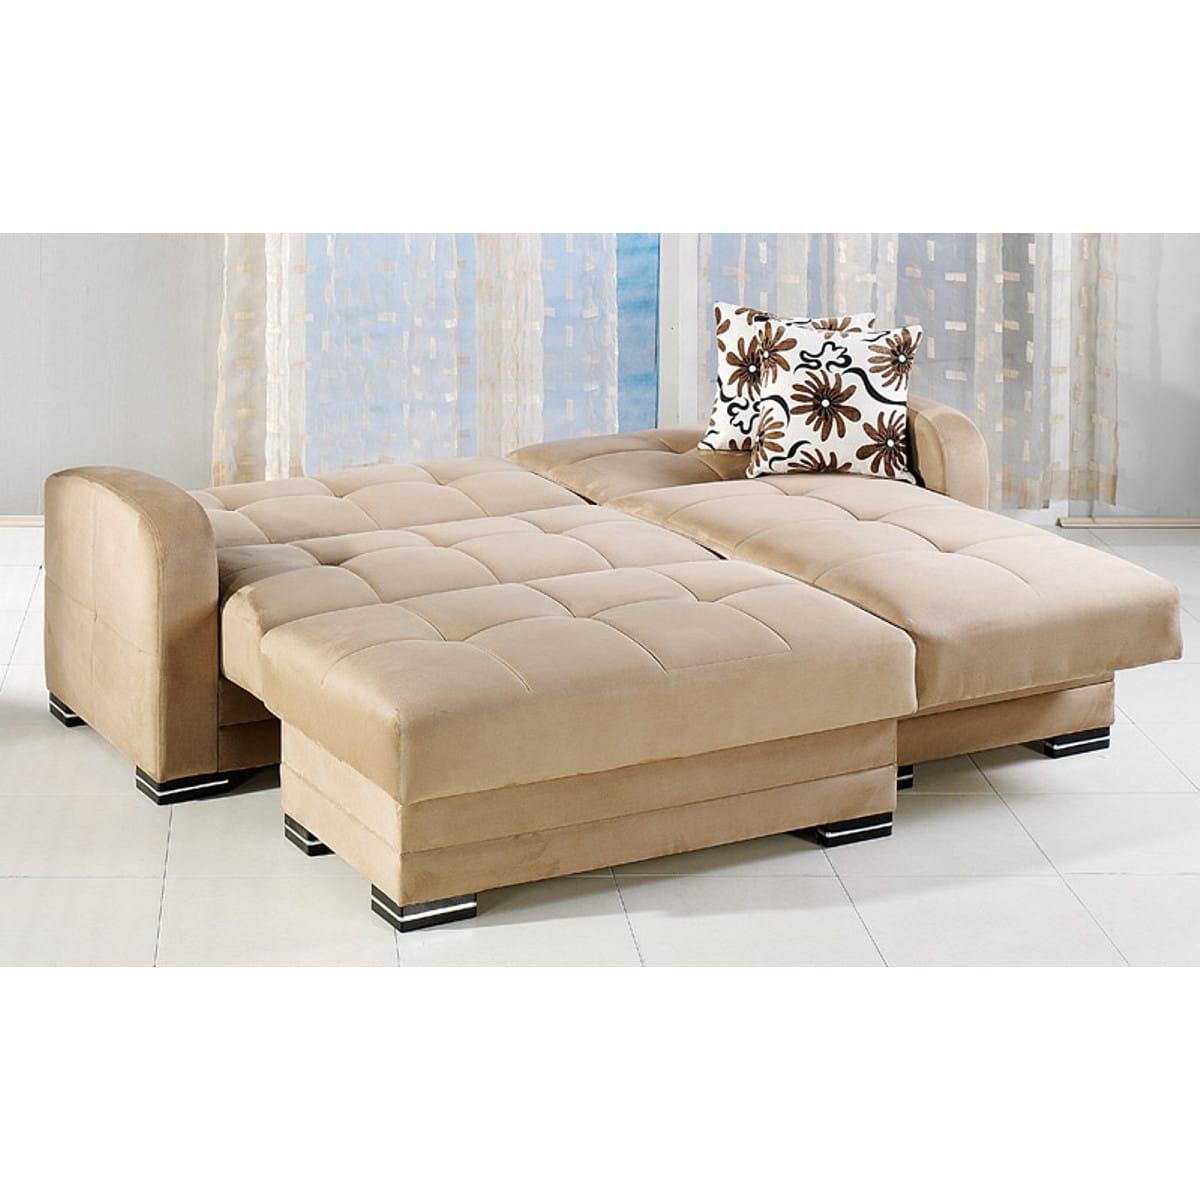 Kubo rainbow dark beige sectional sofa by istikbal sunset for Dark beige sectional sofa